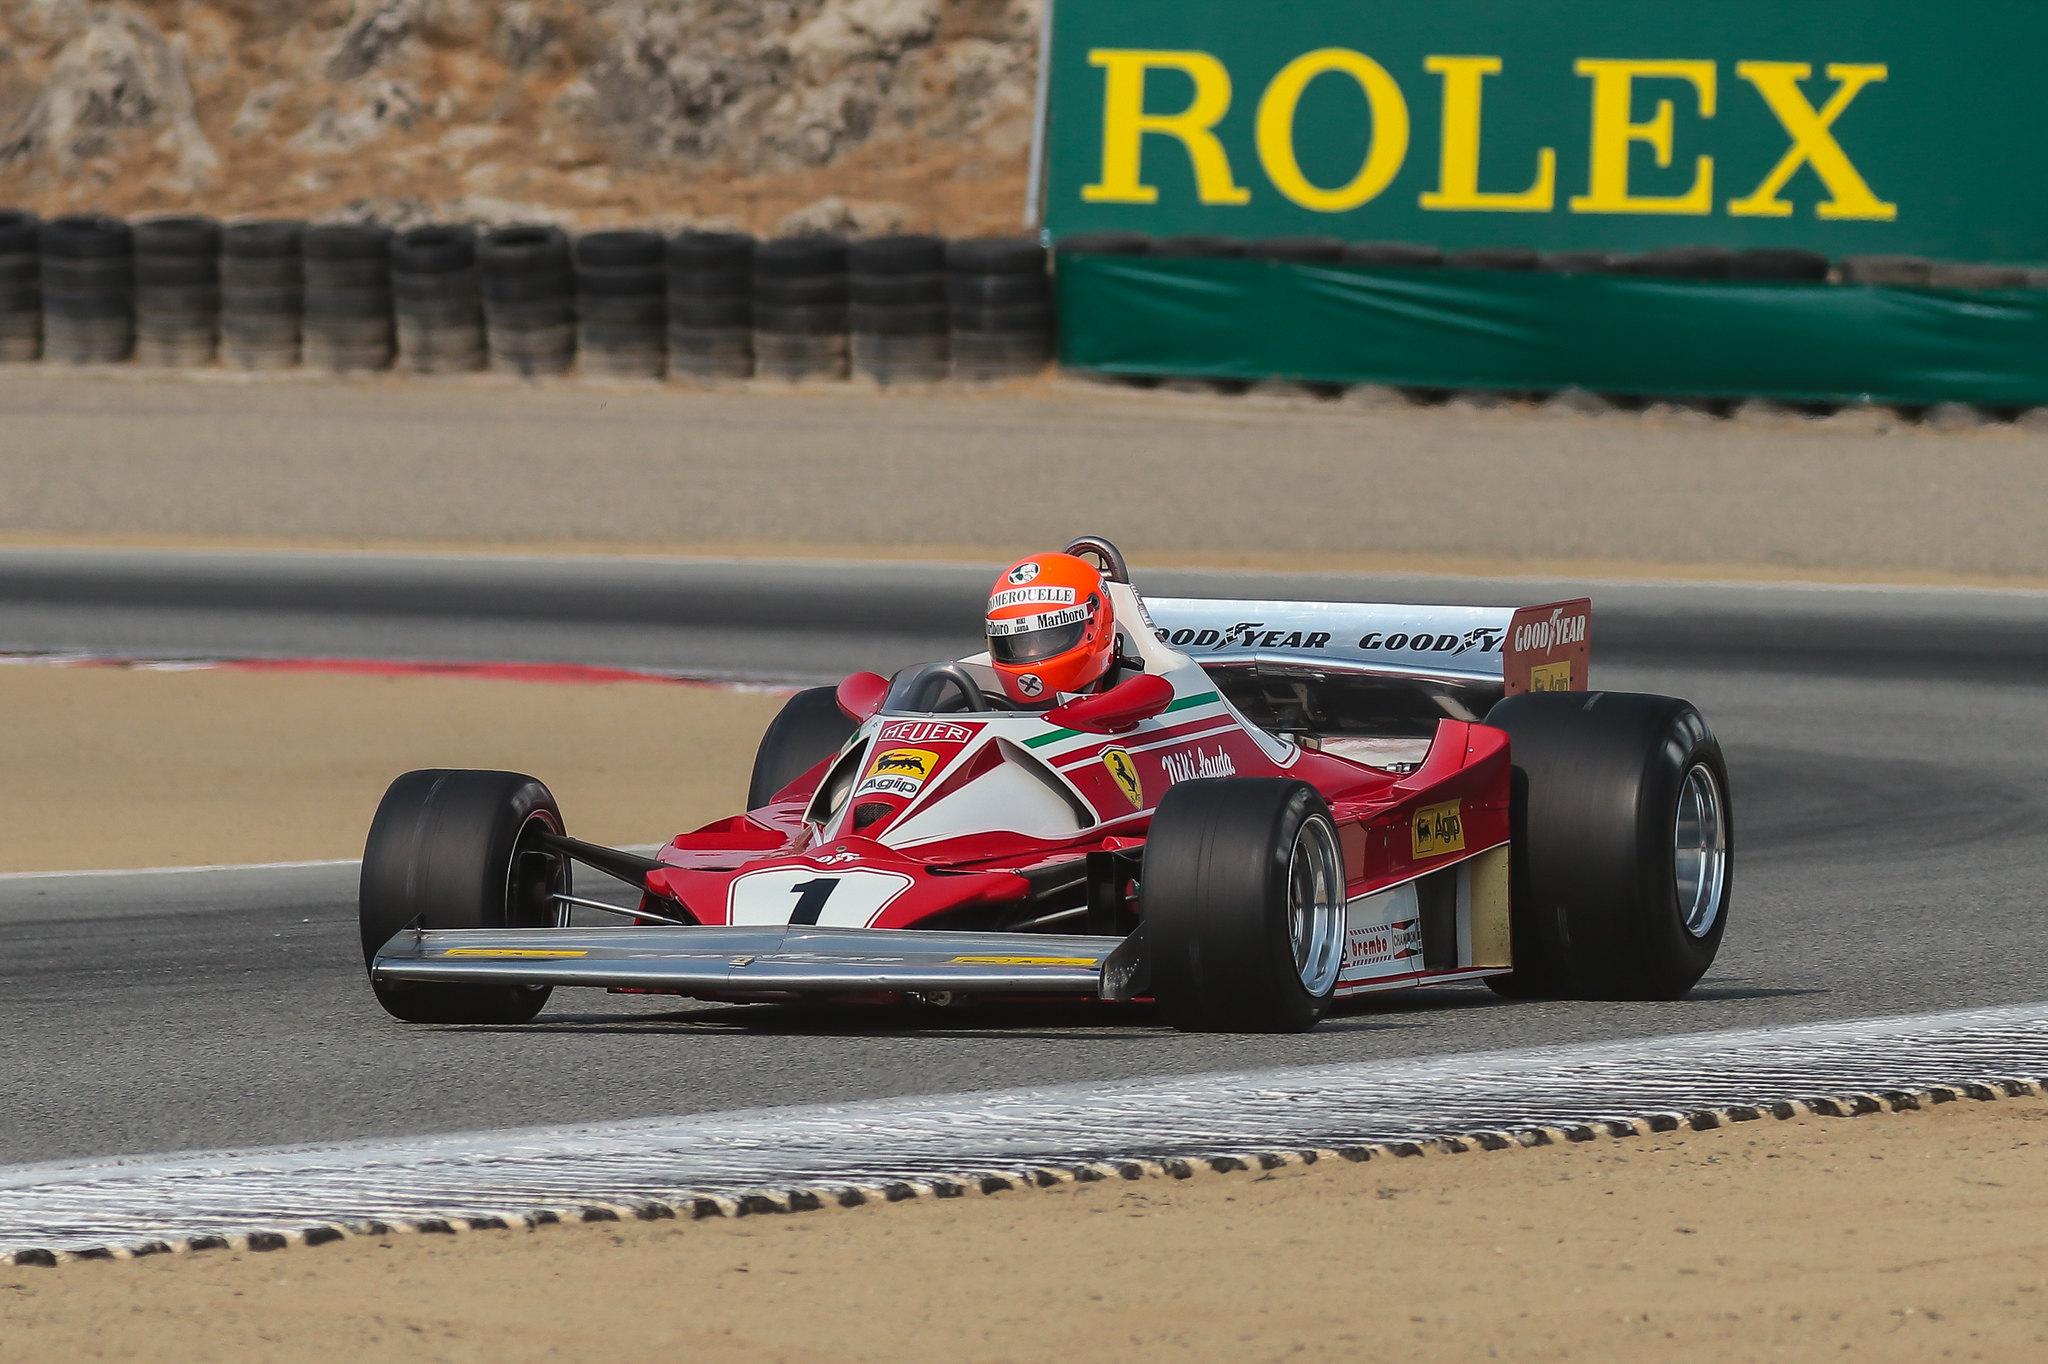 Legendary Cars at the Reunion, including classic Formula 1